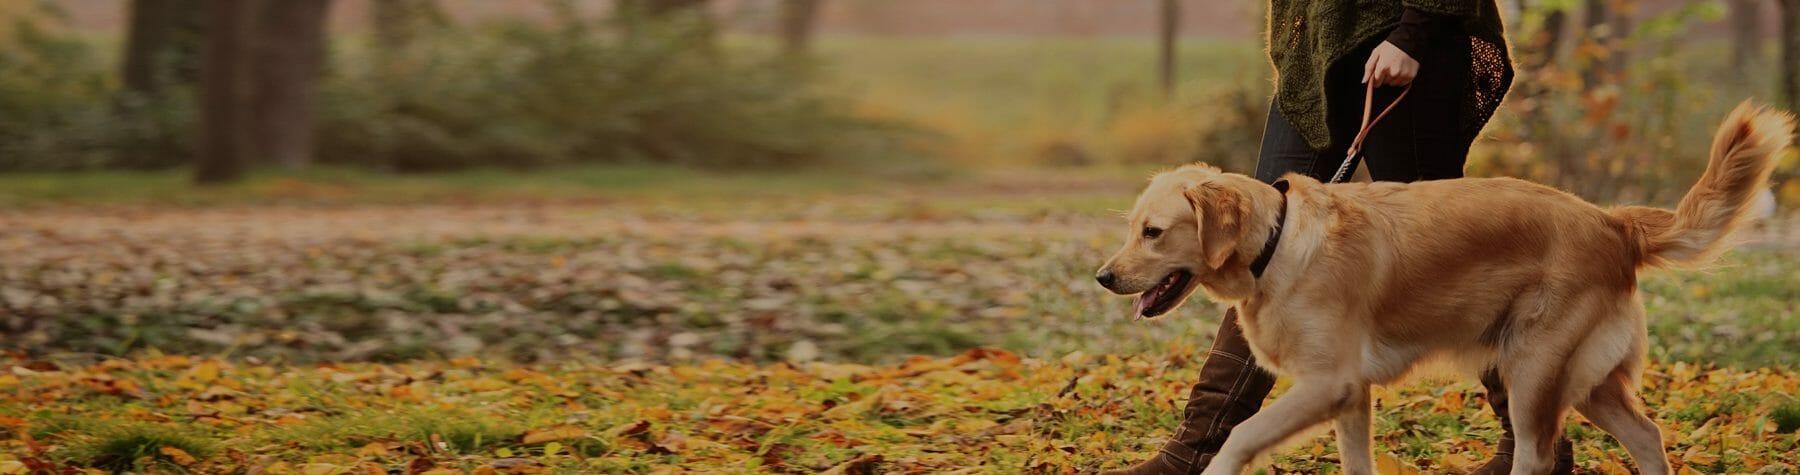 Pet Policy - Woodlands Pet Friendly Condo Rentals